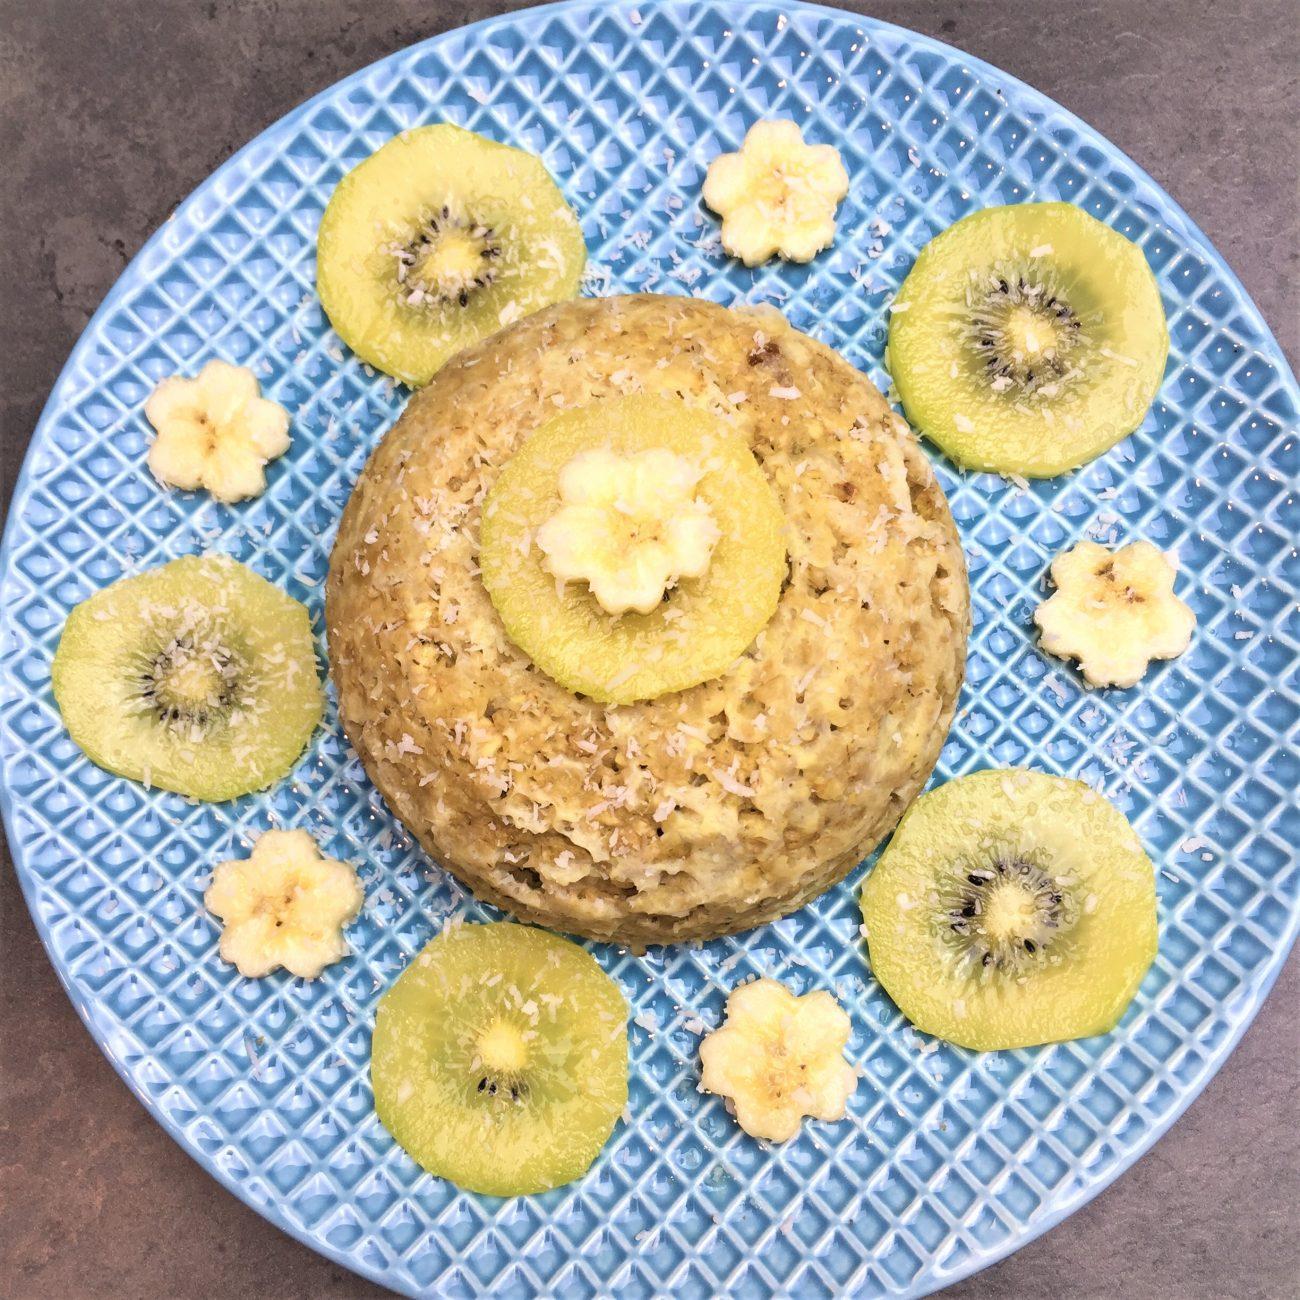 Bowlcake enneigé